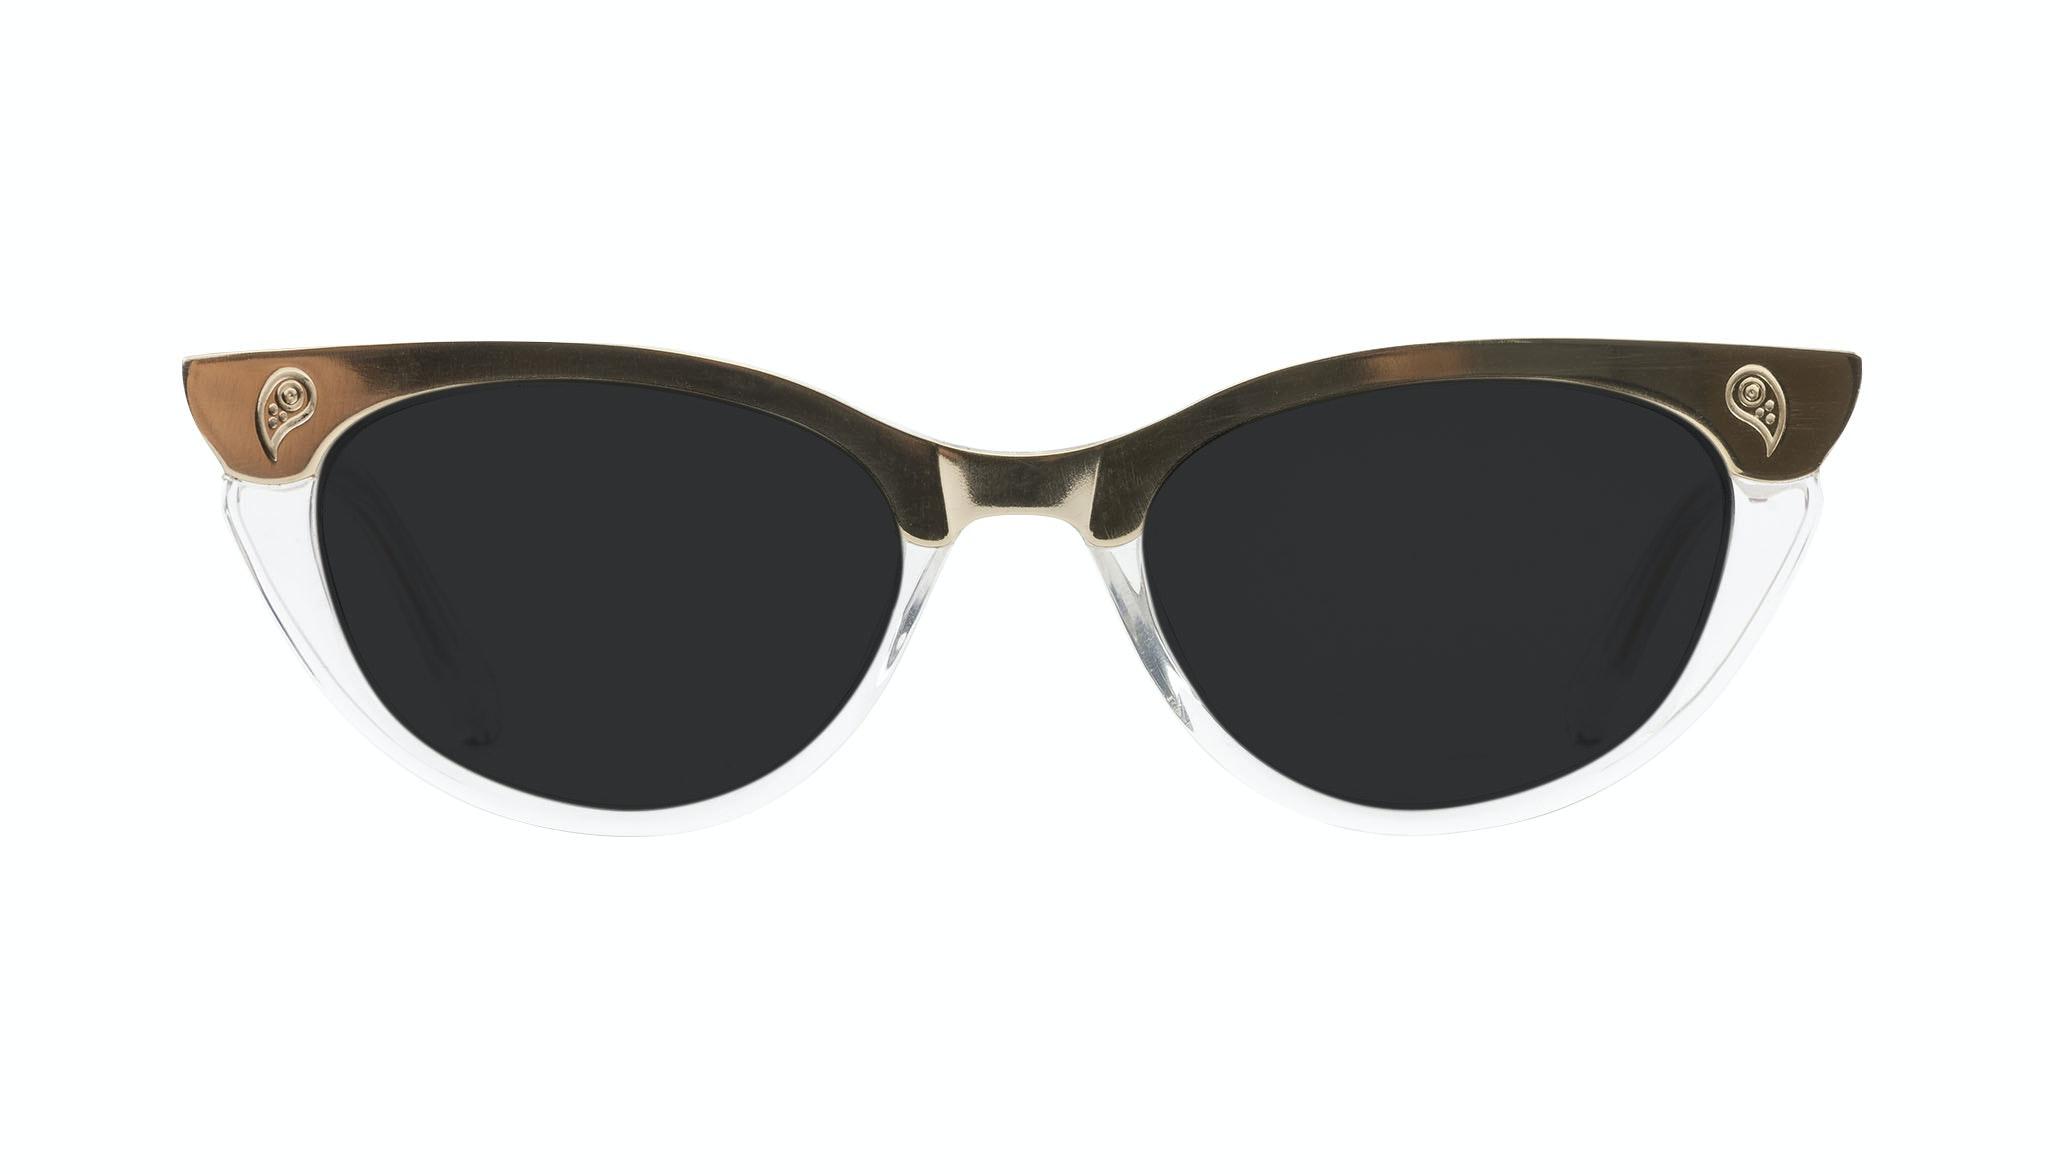 Affordable Fashion Glasses Cat Eye Daring Cateye Sunglasses Women Bad Beti Babbu